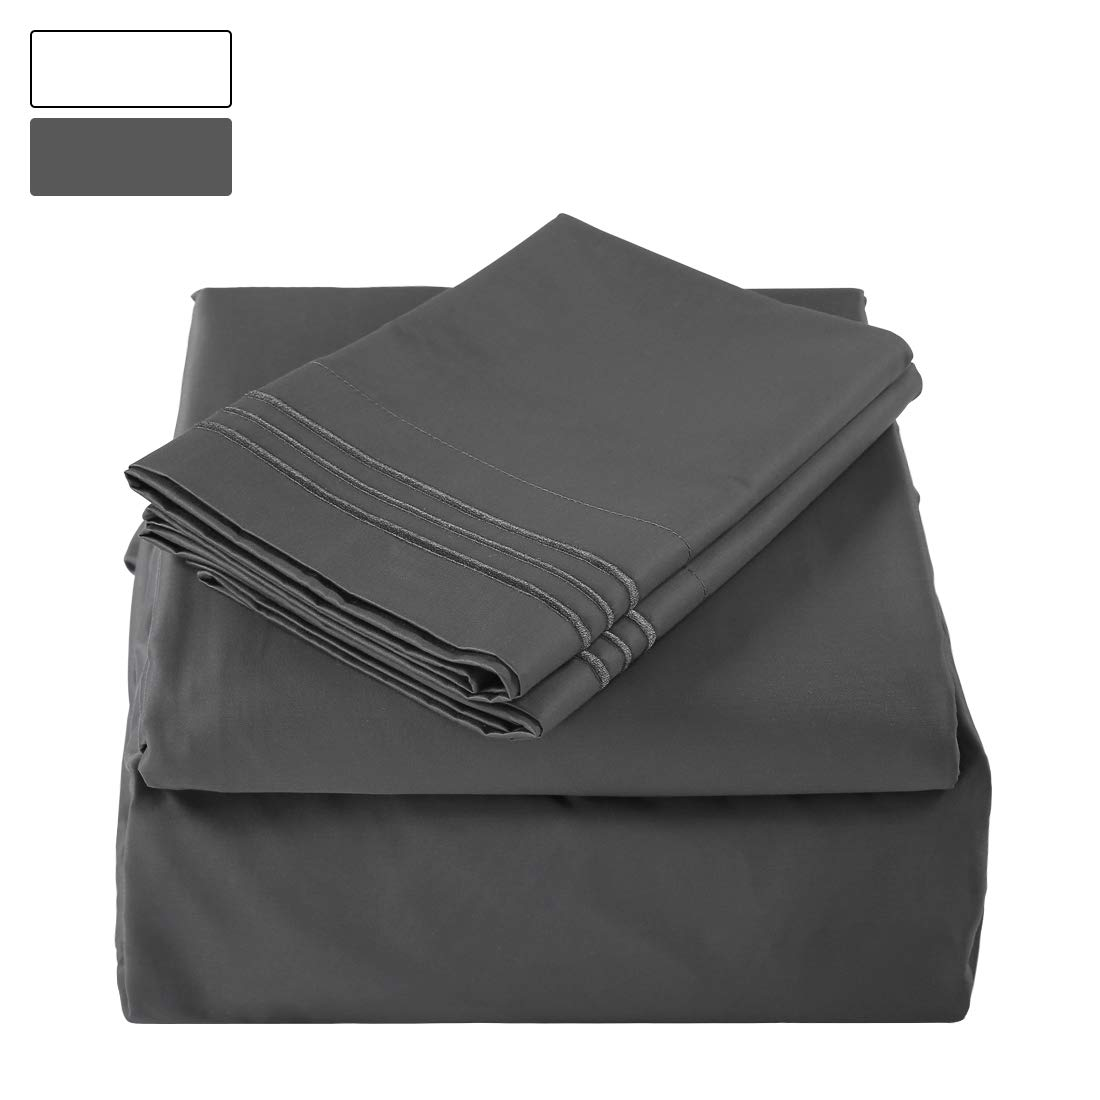 BALICHUN 100% Pure Natural Cotton Hotel Luxury Super Soft 1000 Thread Count Premium Bed Sheets Set,12-Inch Deep Pockets, Hypoallergenic, Wrinkle & Fade Resistant Bedding Set-4 Piece (Darkgrey, Queen)